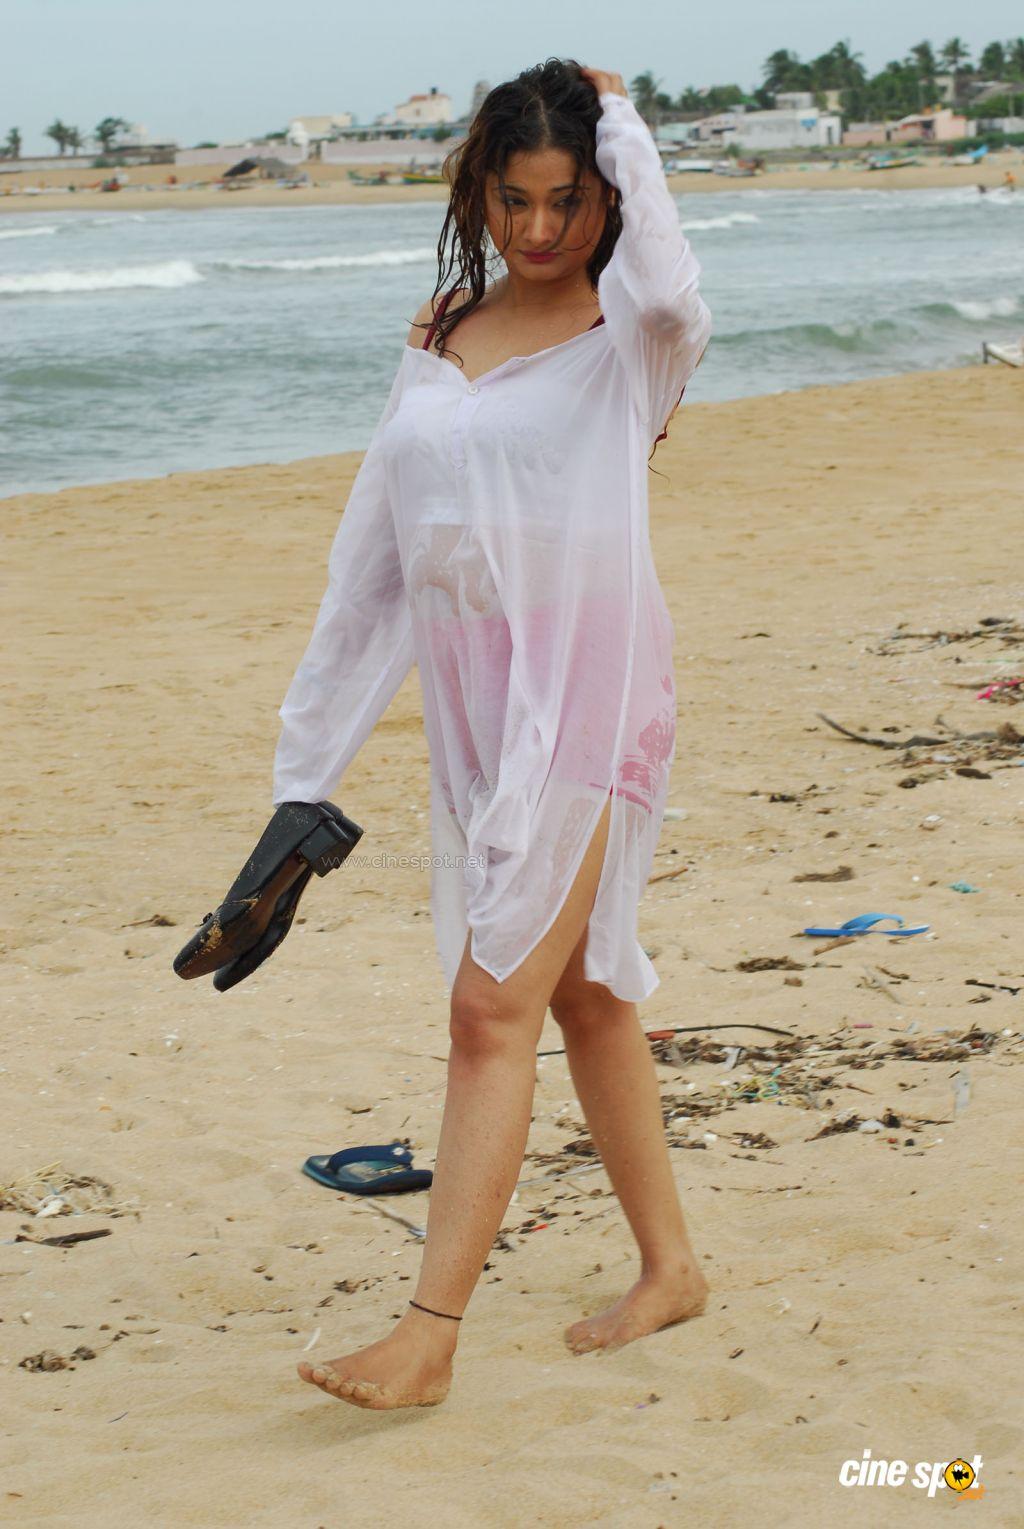 http://3.bp.blogspot.com/-m0JmJNiQg0A/TzKqVCtSLlI/AAAAAAAAEu8/AV7S3Av8me8/s1600/High+School+Telugu+Movie,+Photos,+(32).jpg